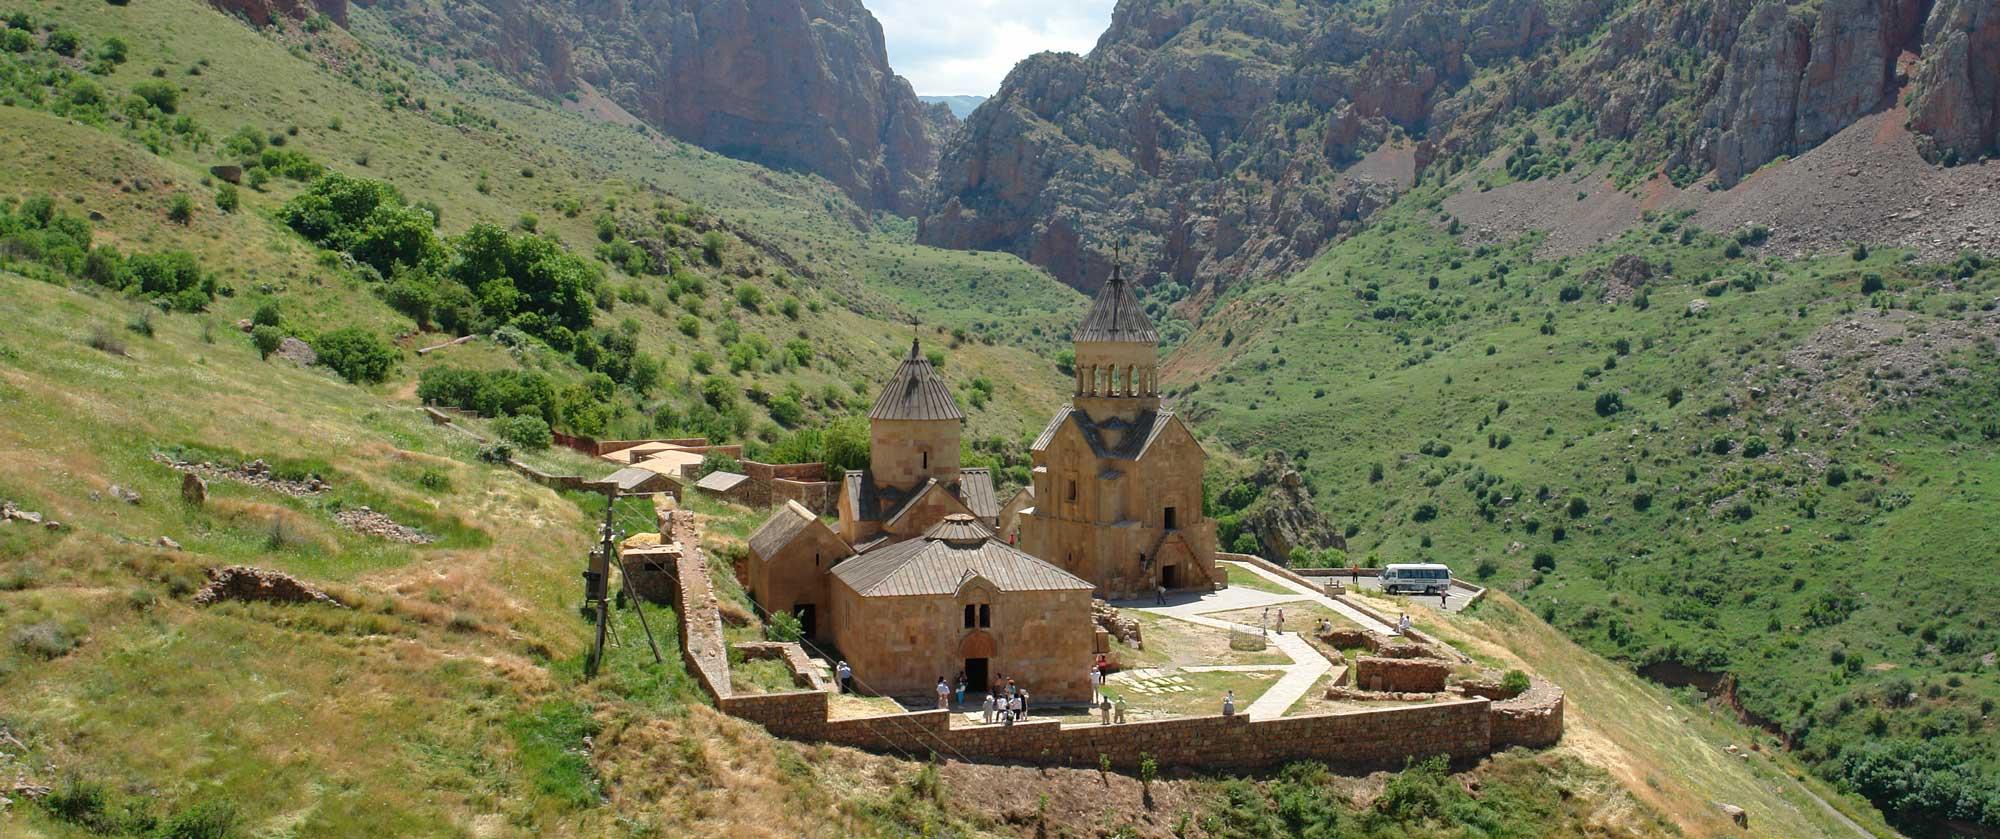 Voyager en Arménie - Utotrip Travel